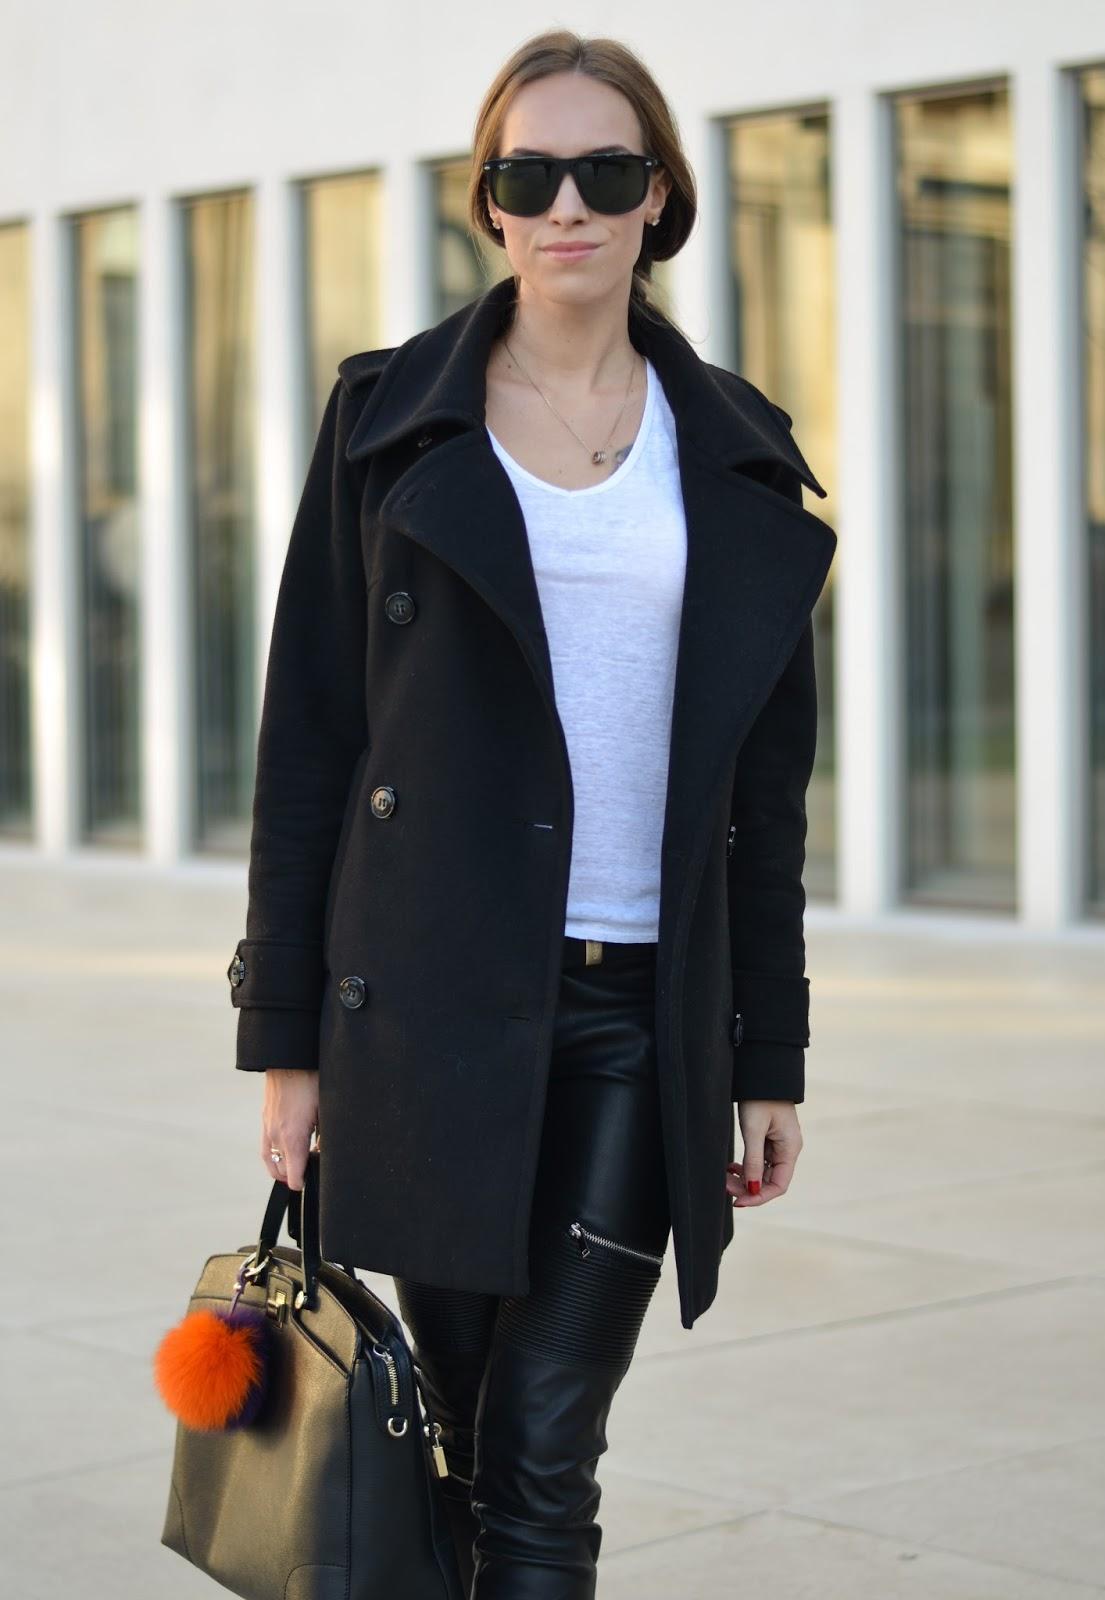 kristjaana mere minimalist fashion casual winter outfit